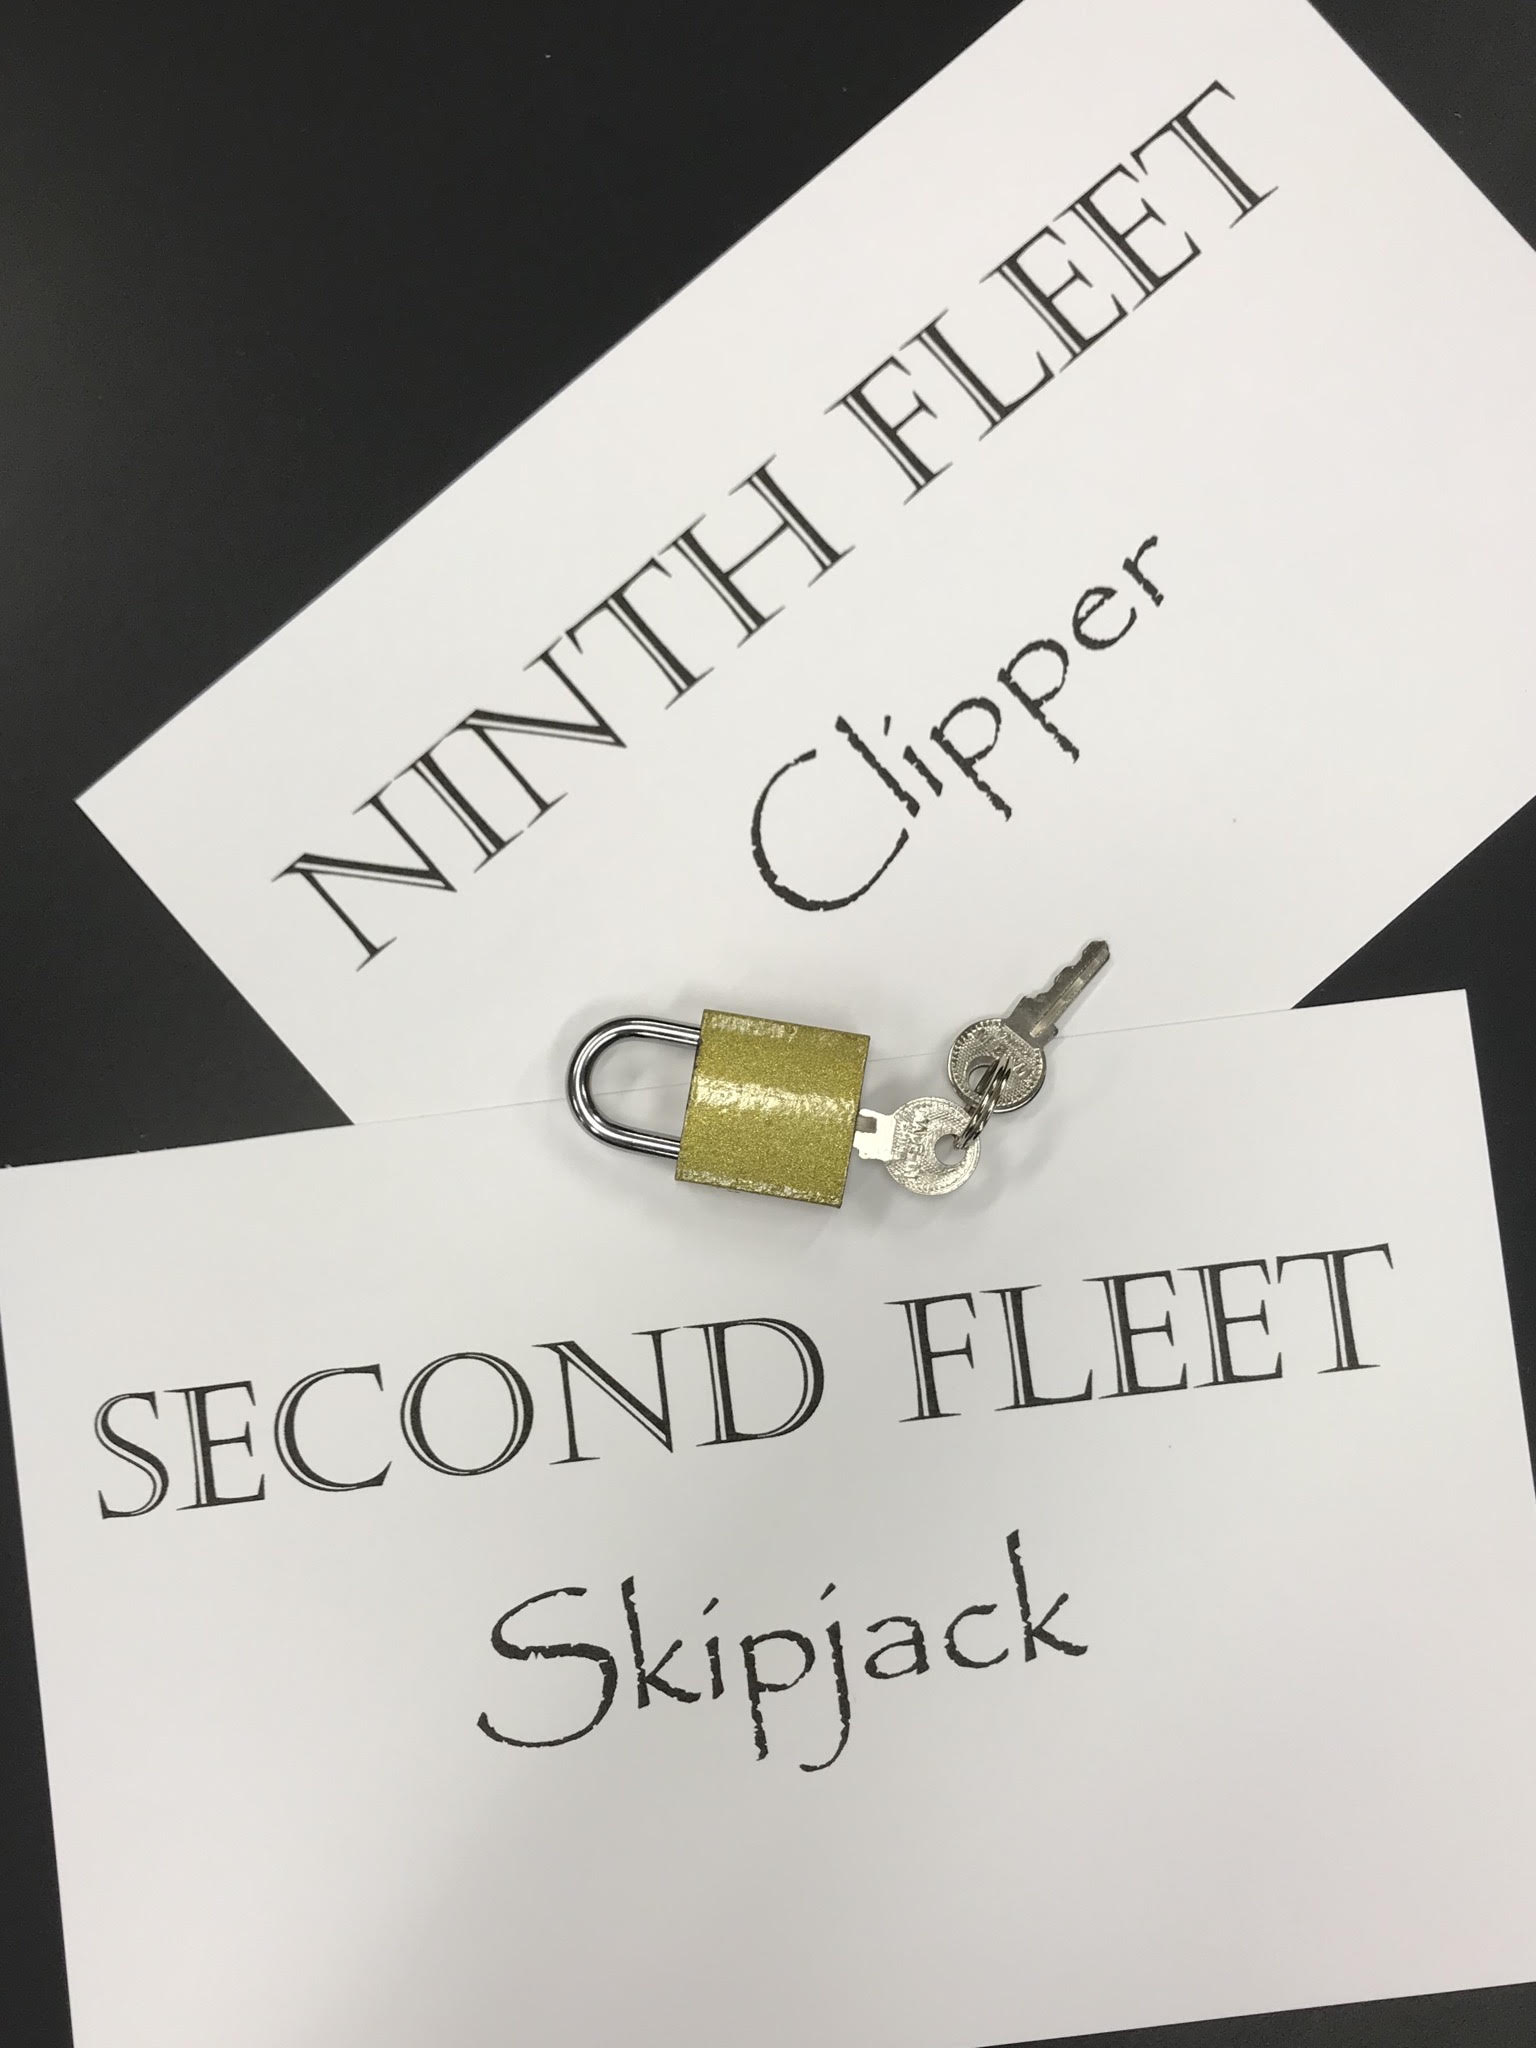 fleets, ships.jpg